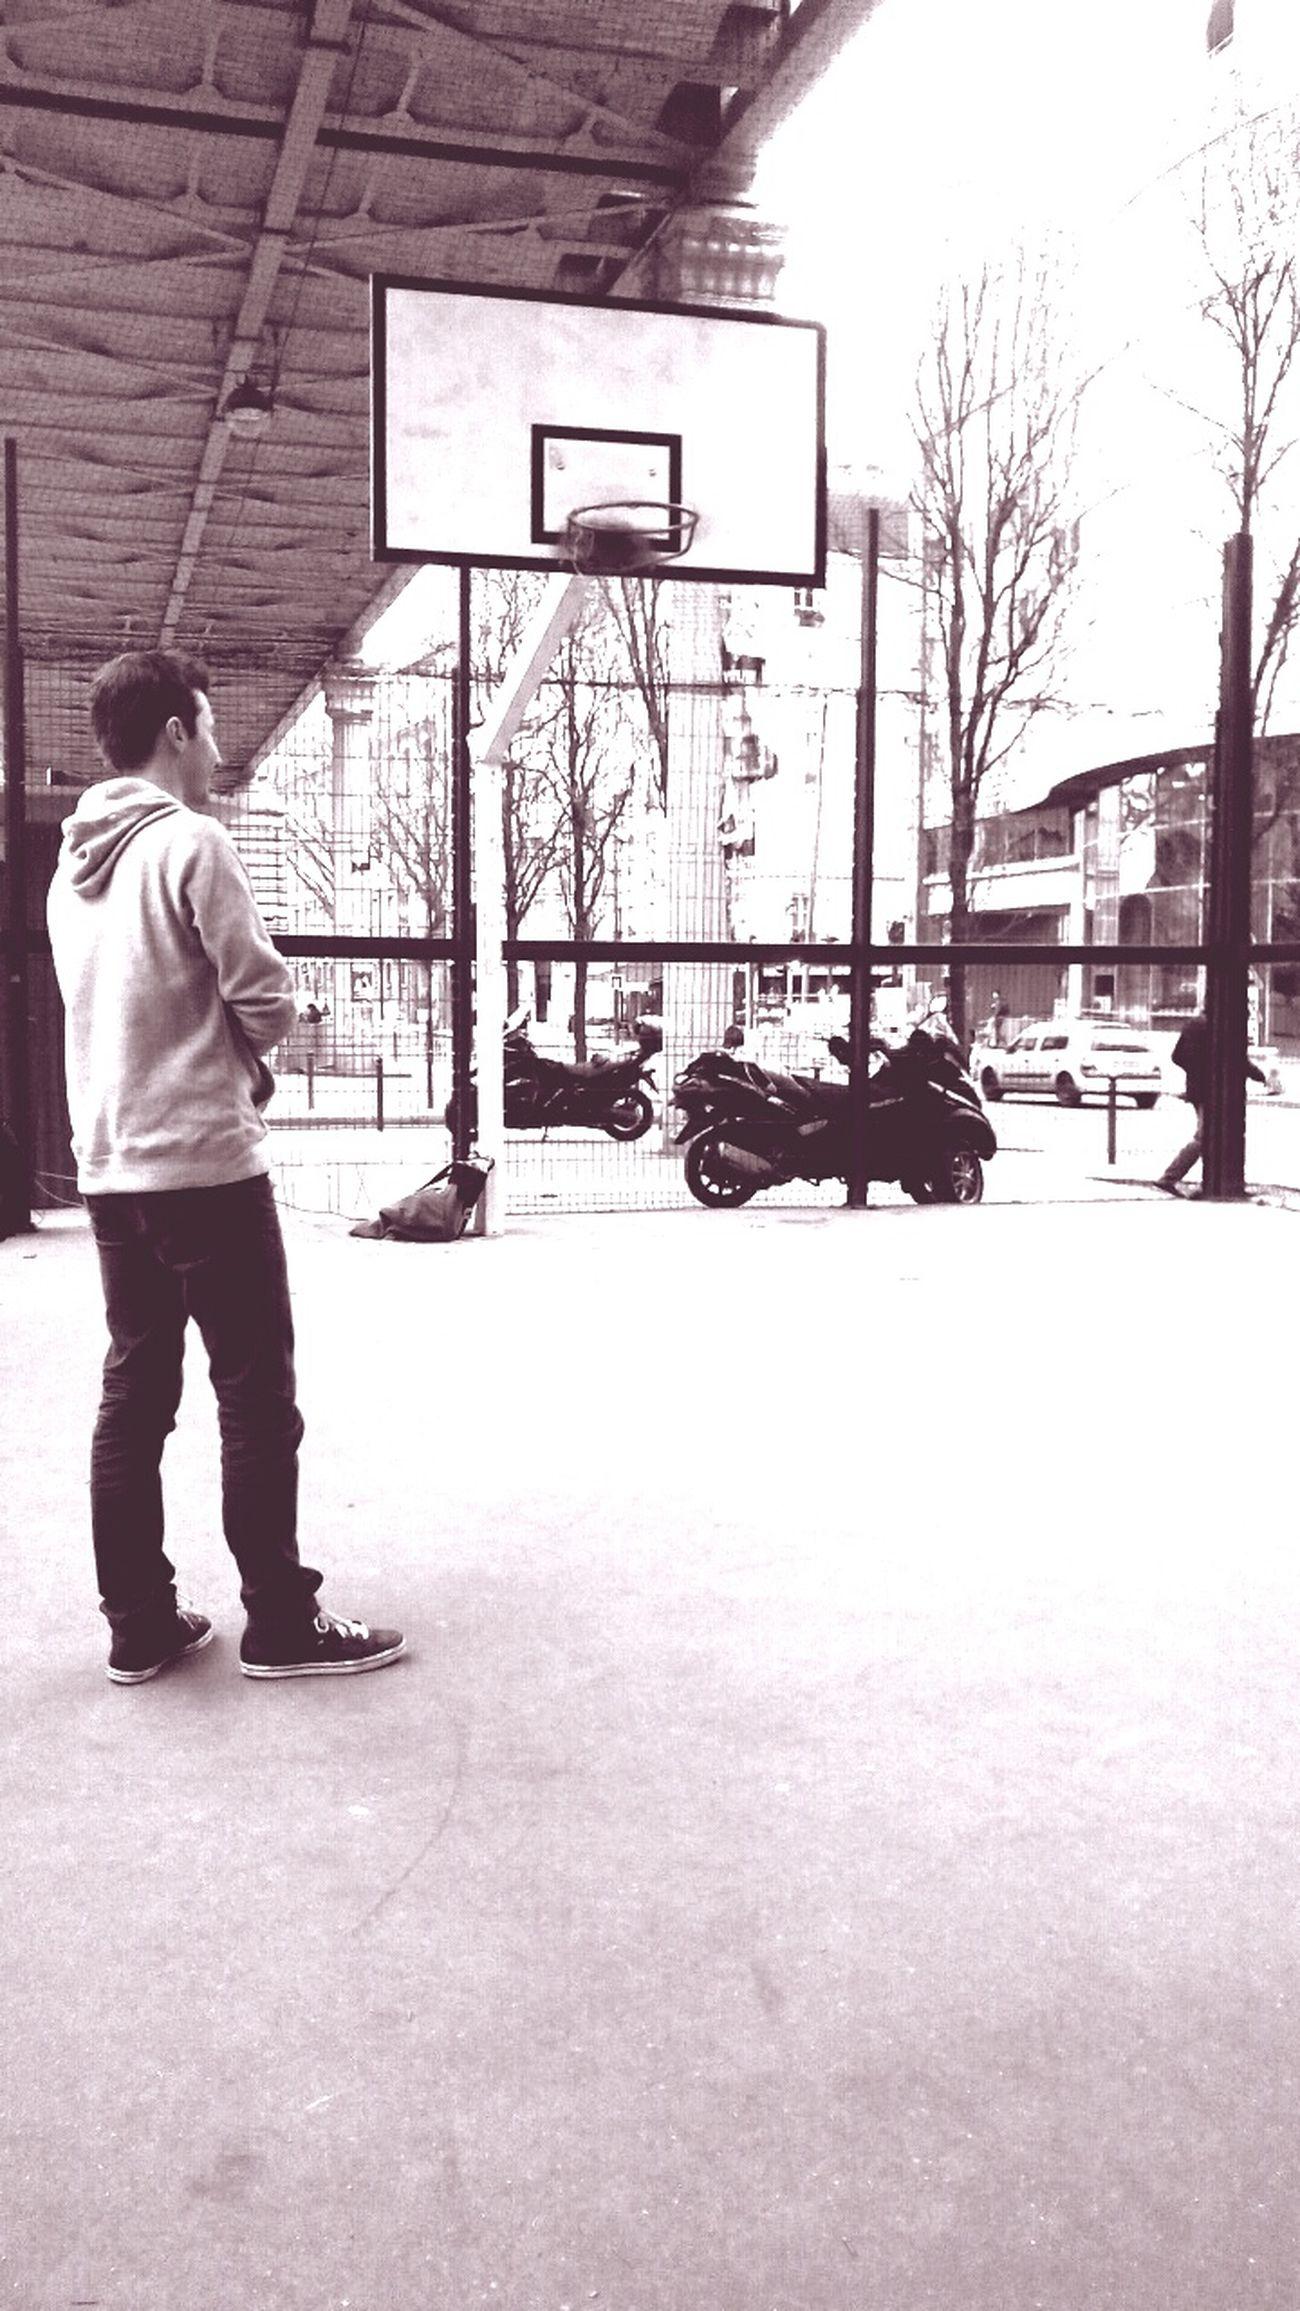 Paris Urban Street Streetbasketball Metro Blackandwhite